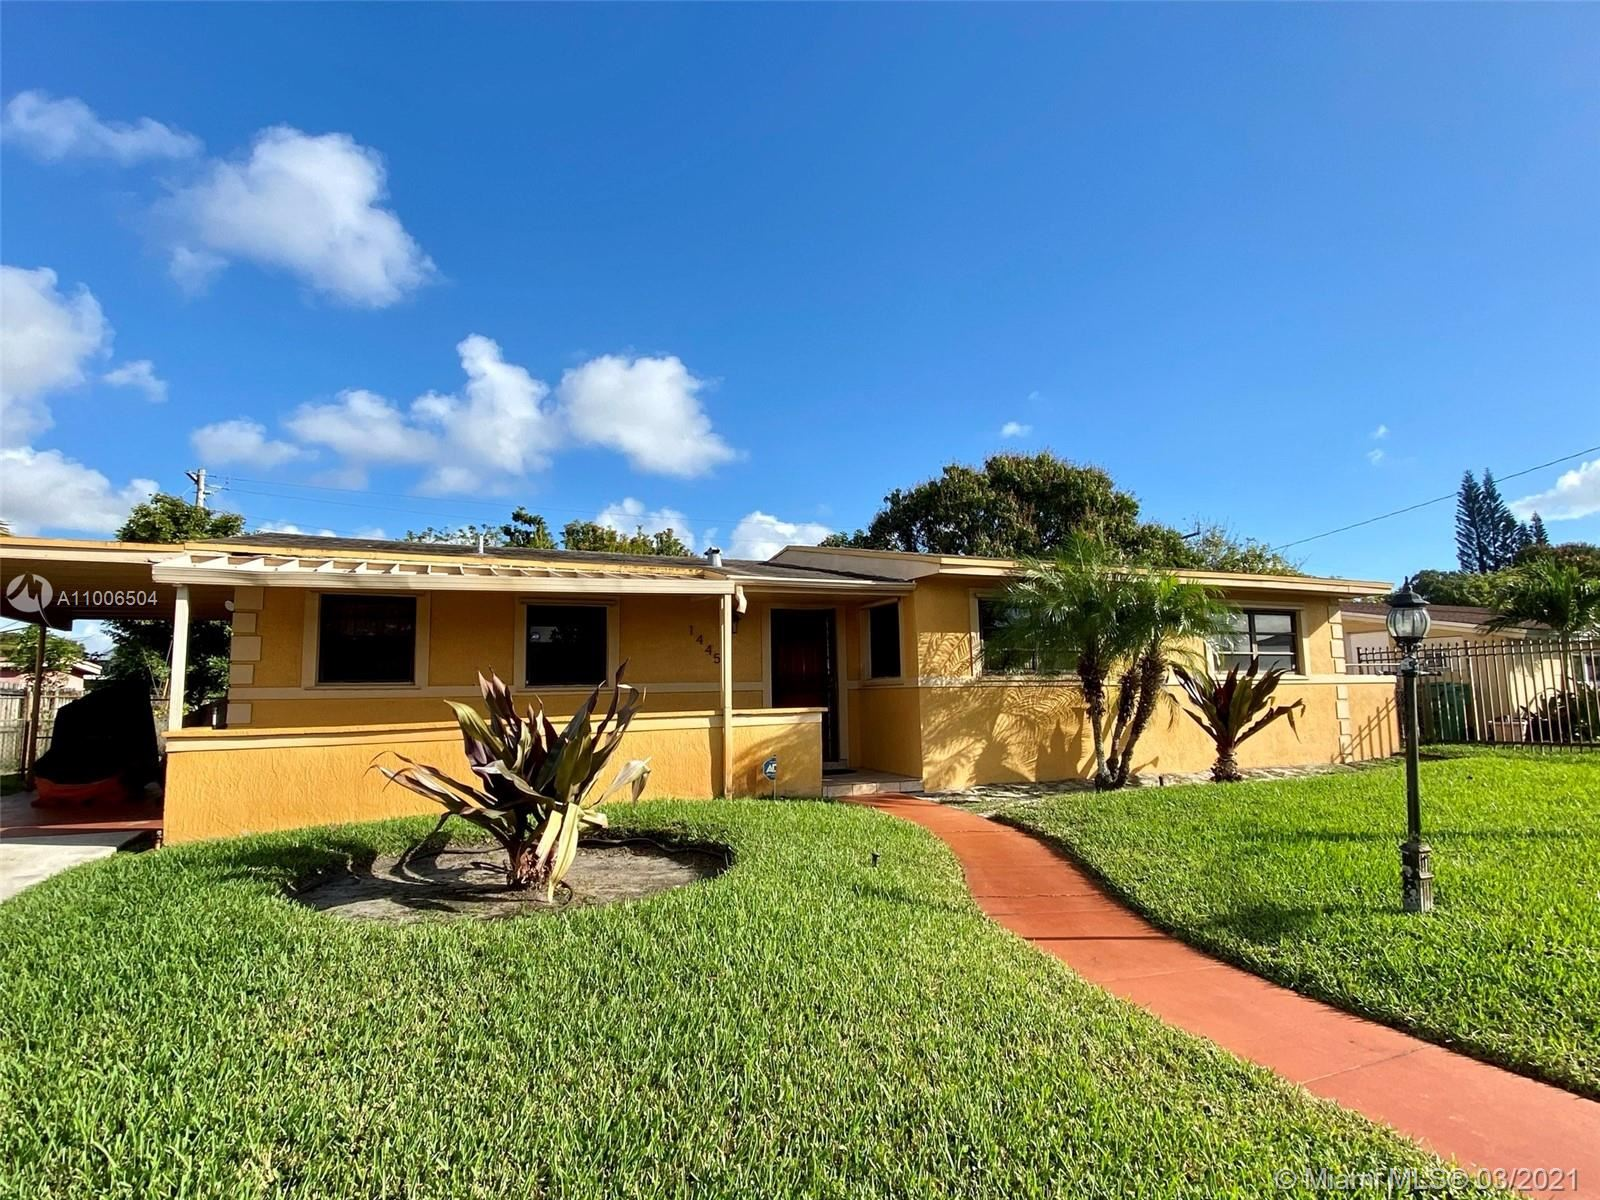 1445 NW 196th Ter, Miami Gardens, FL 33169 - #: A11006504